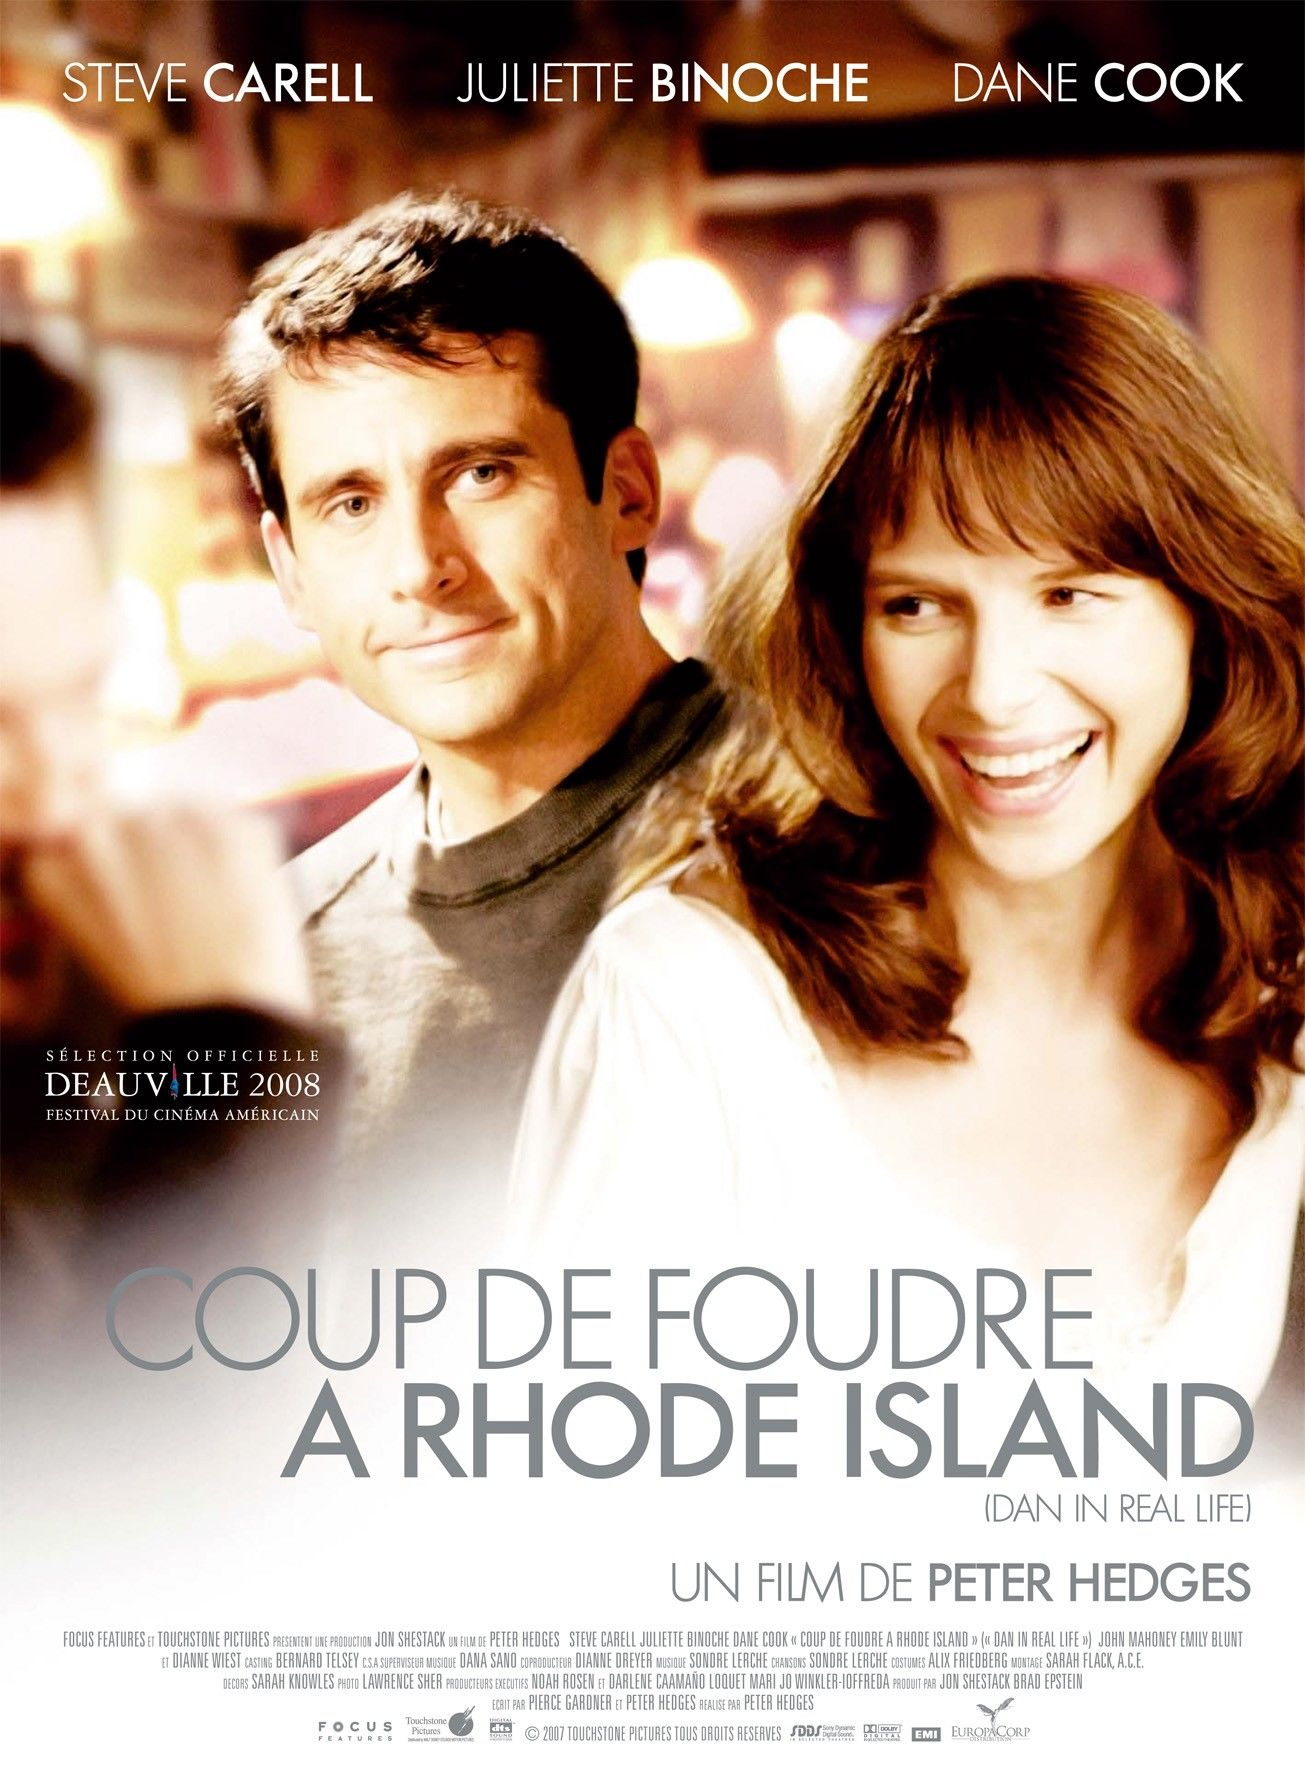 Foudre Saison 4 Qualite Dvdrip DVDRip advisorfilecloud